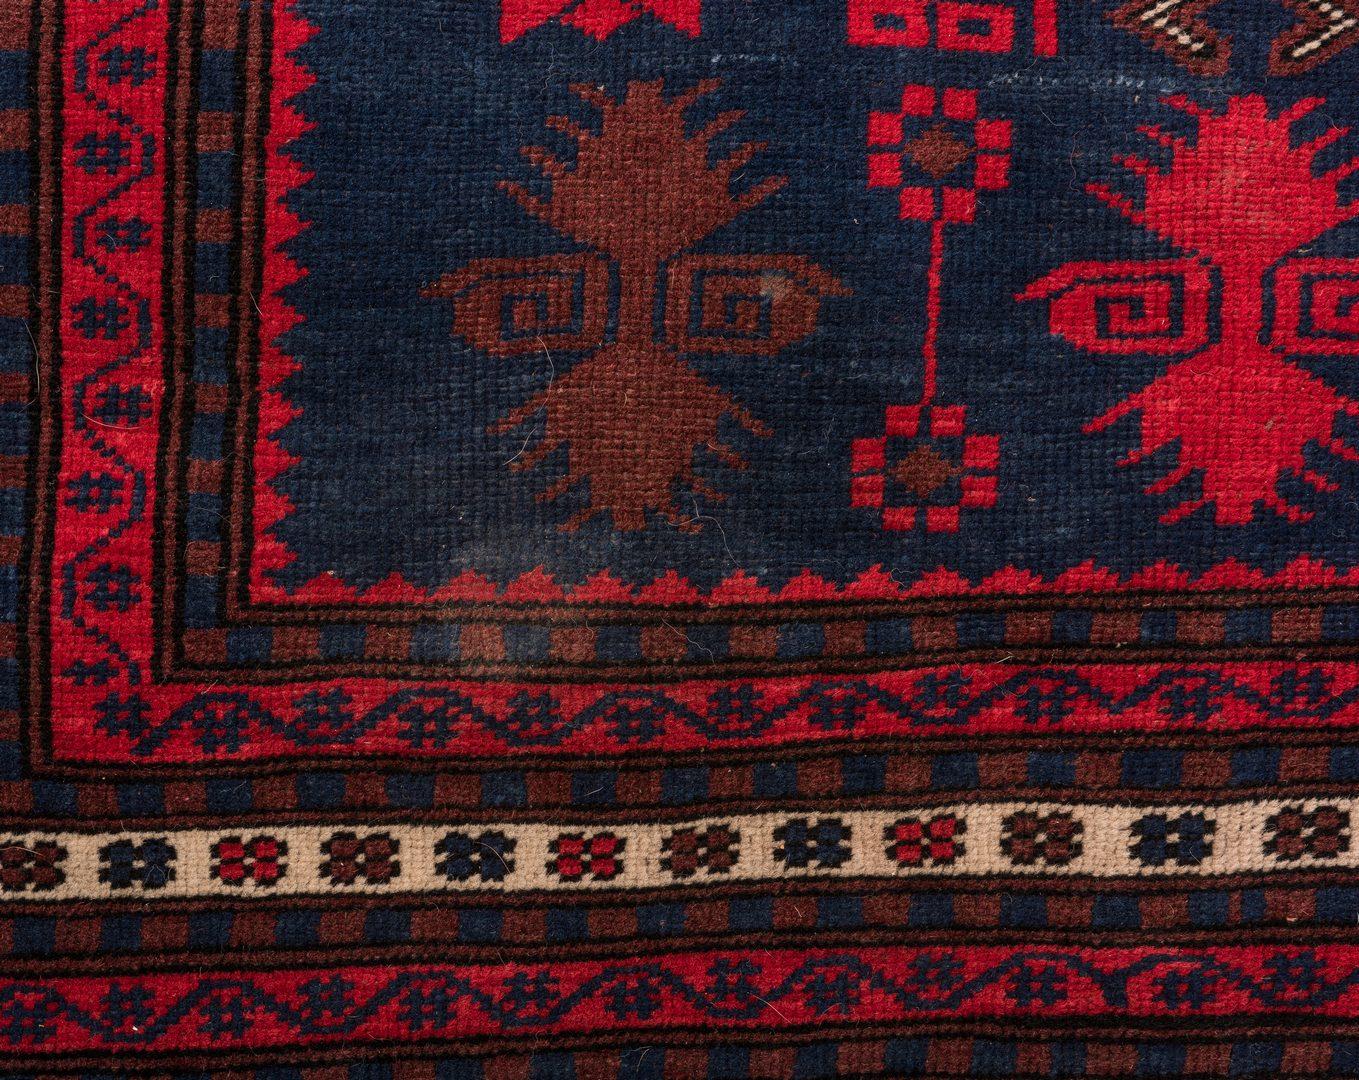 Lot 837: Semi-antique Turkish Tribal Rug, 6.5 x 3.8